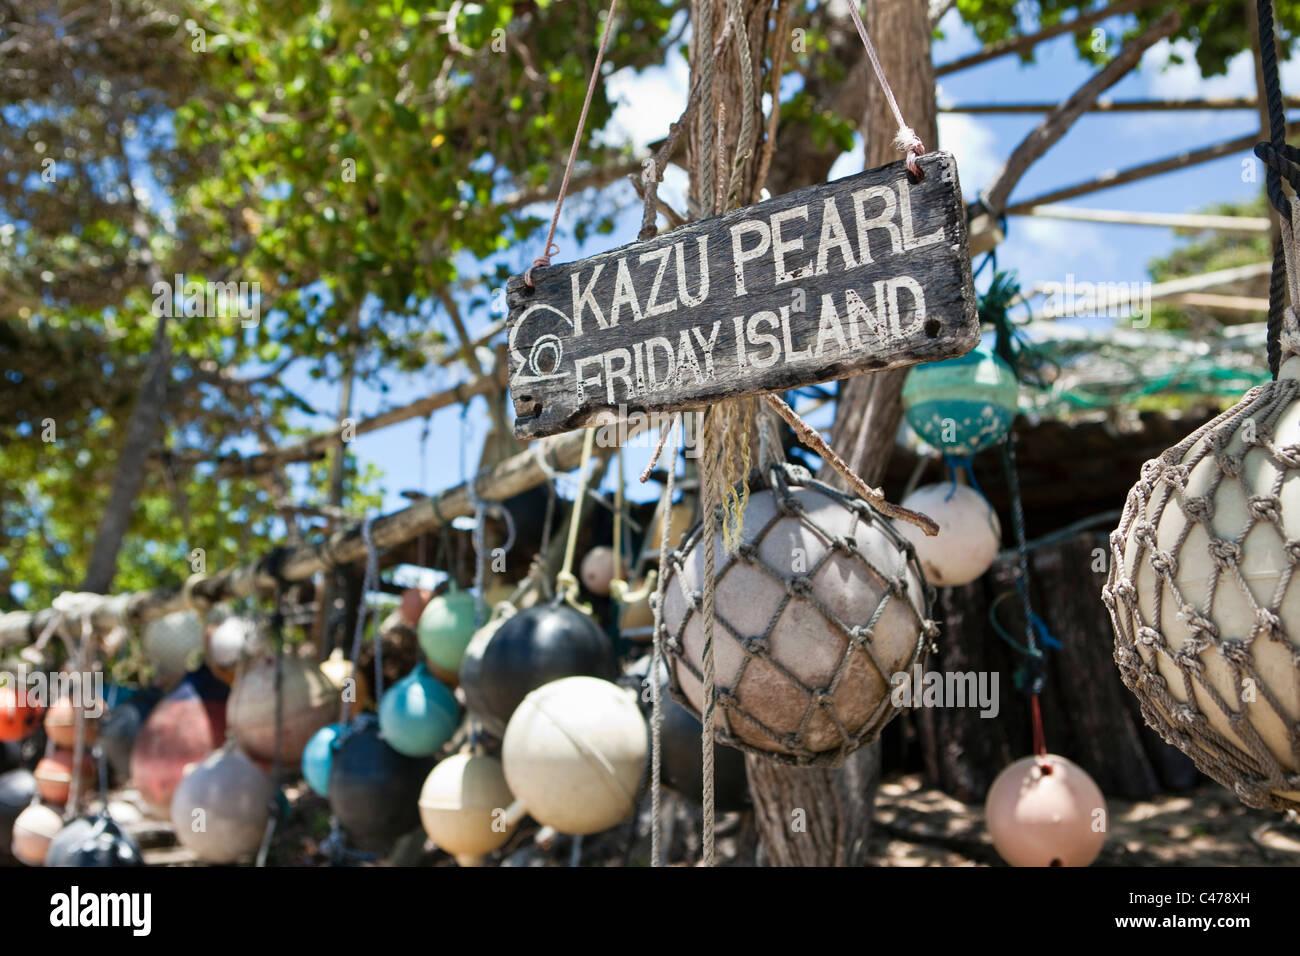 Kazu Pearls at Friday Island, Torres Strait Islands, Queensland, Australia - Stock Image